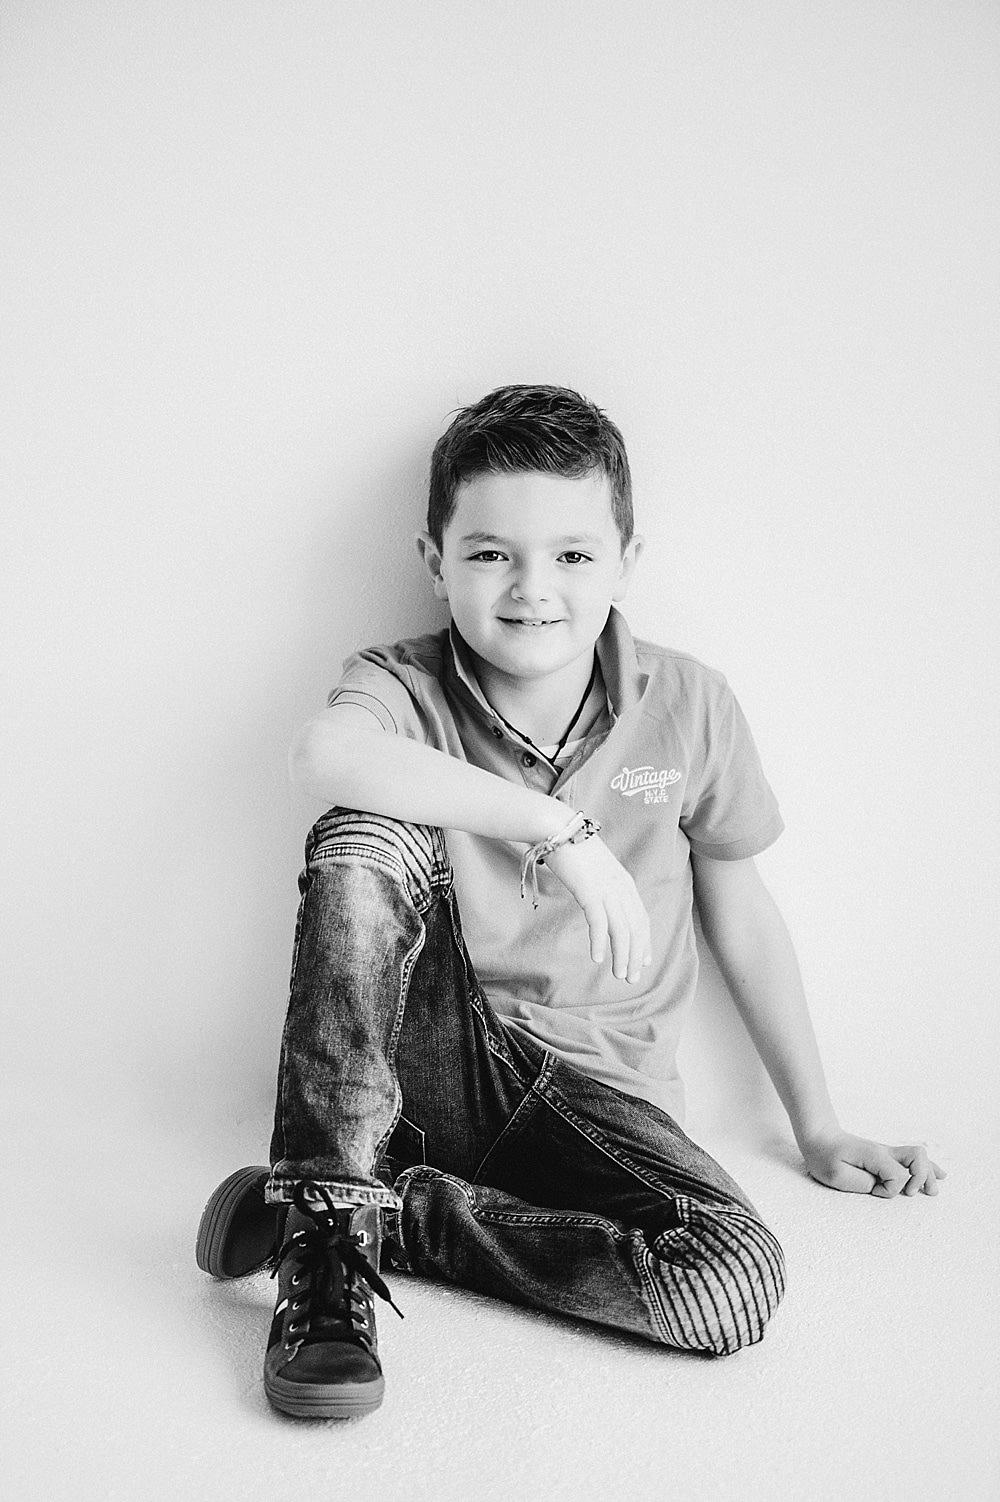 Familiebilder, Familieshooting, Kinderfotograf, Kinderfotografie, Kinderfotos, Fotograf Ostschweiz